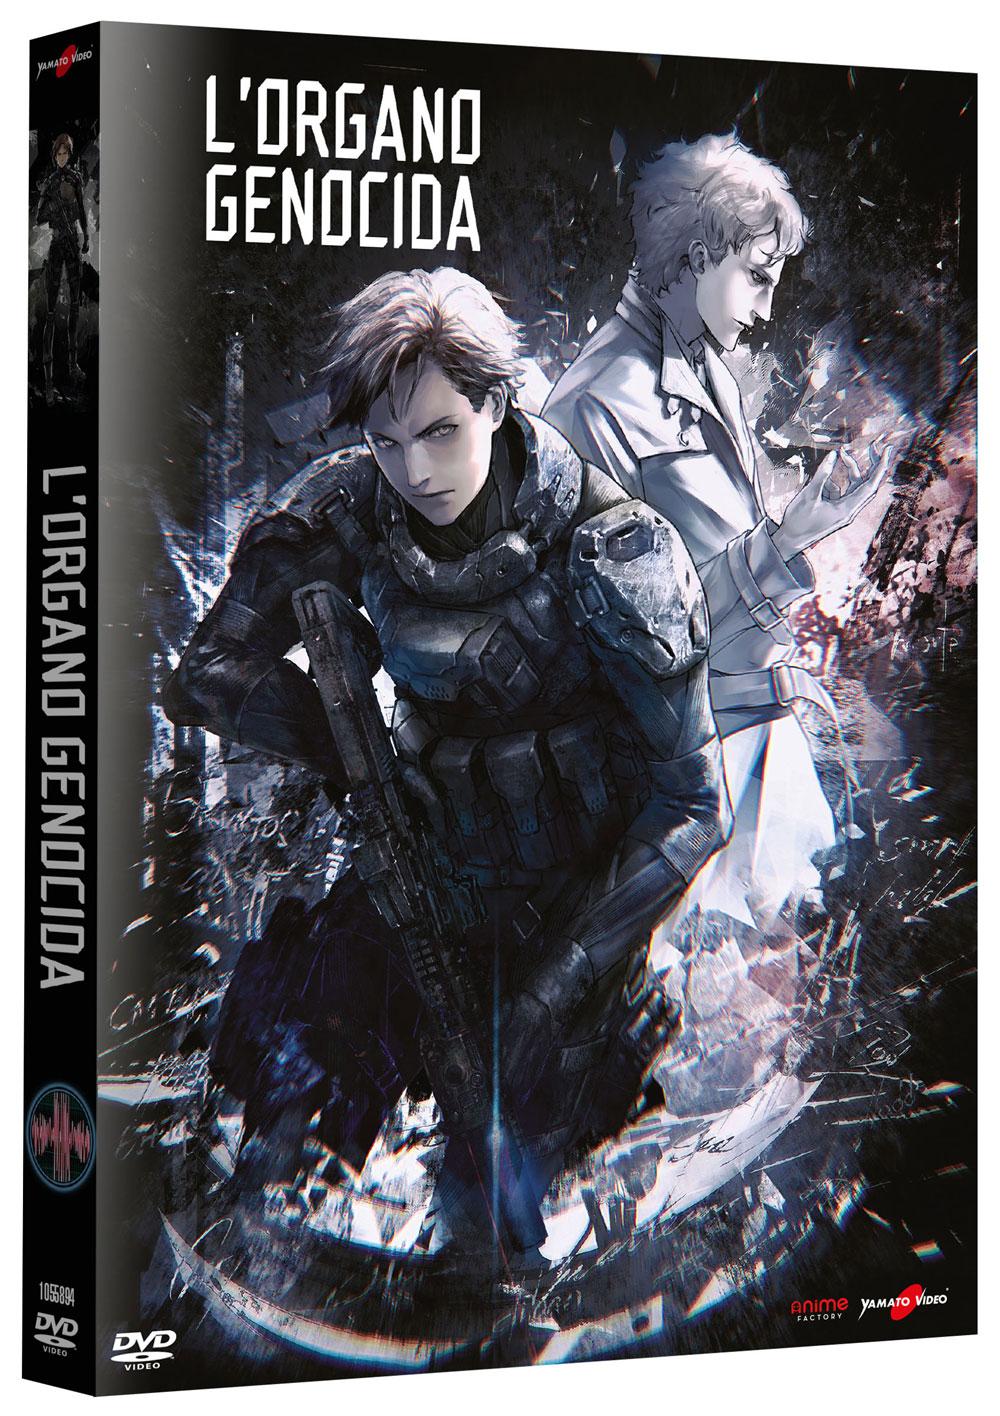 L'ORGANO GENOCIDA (DVD)